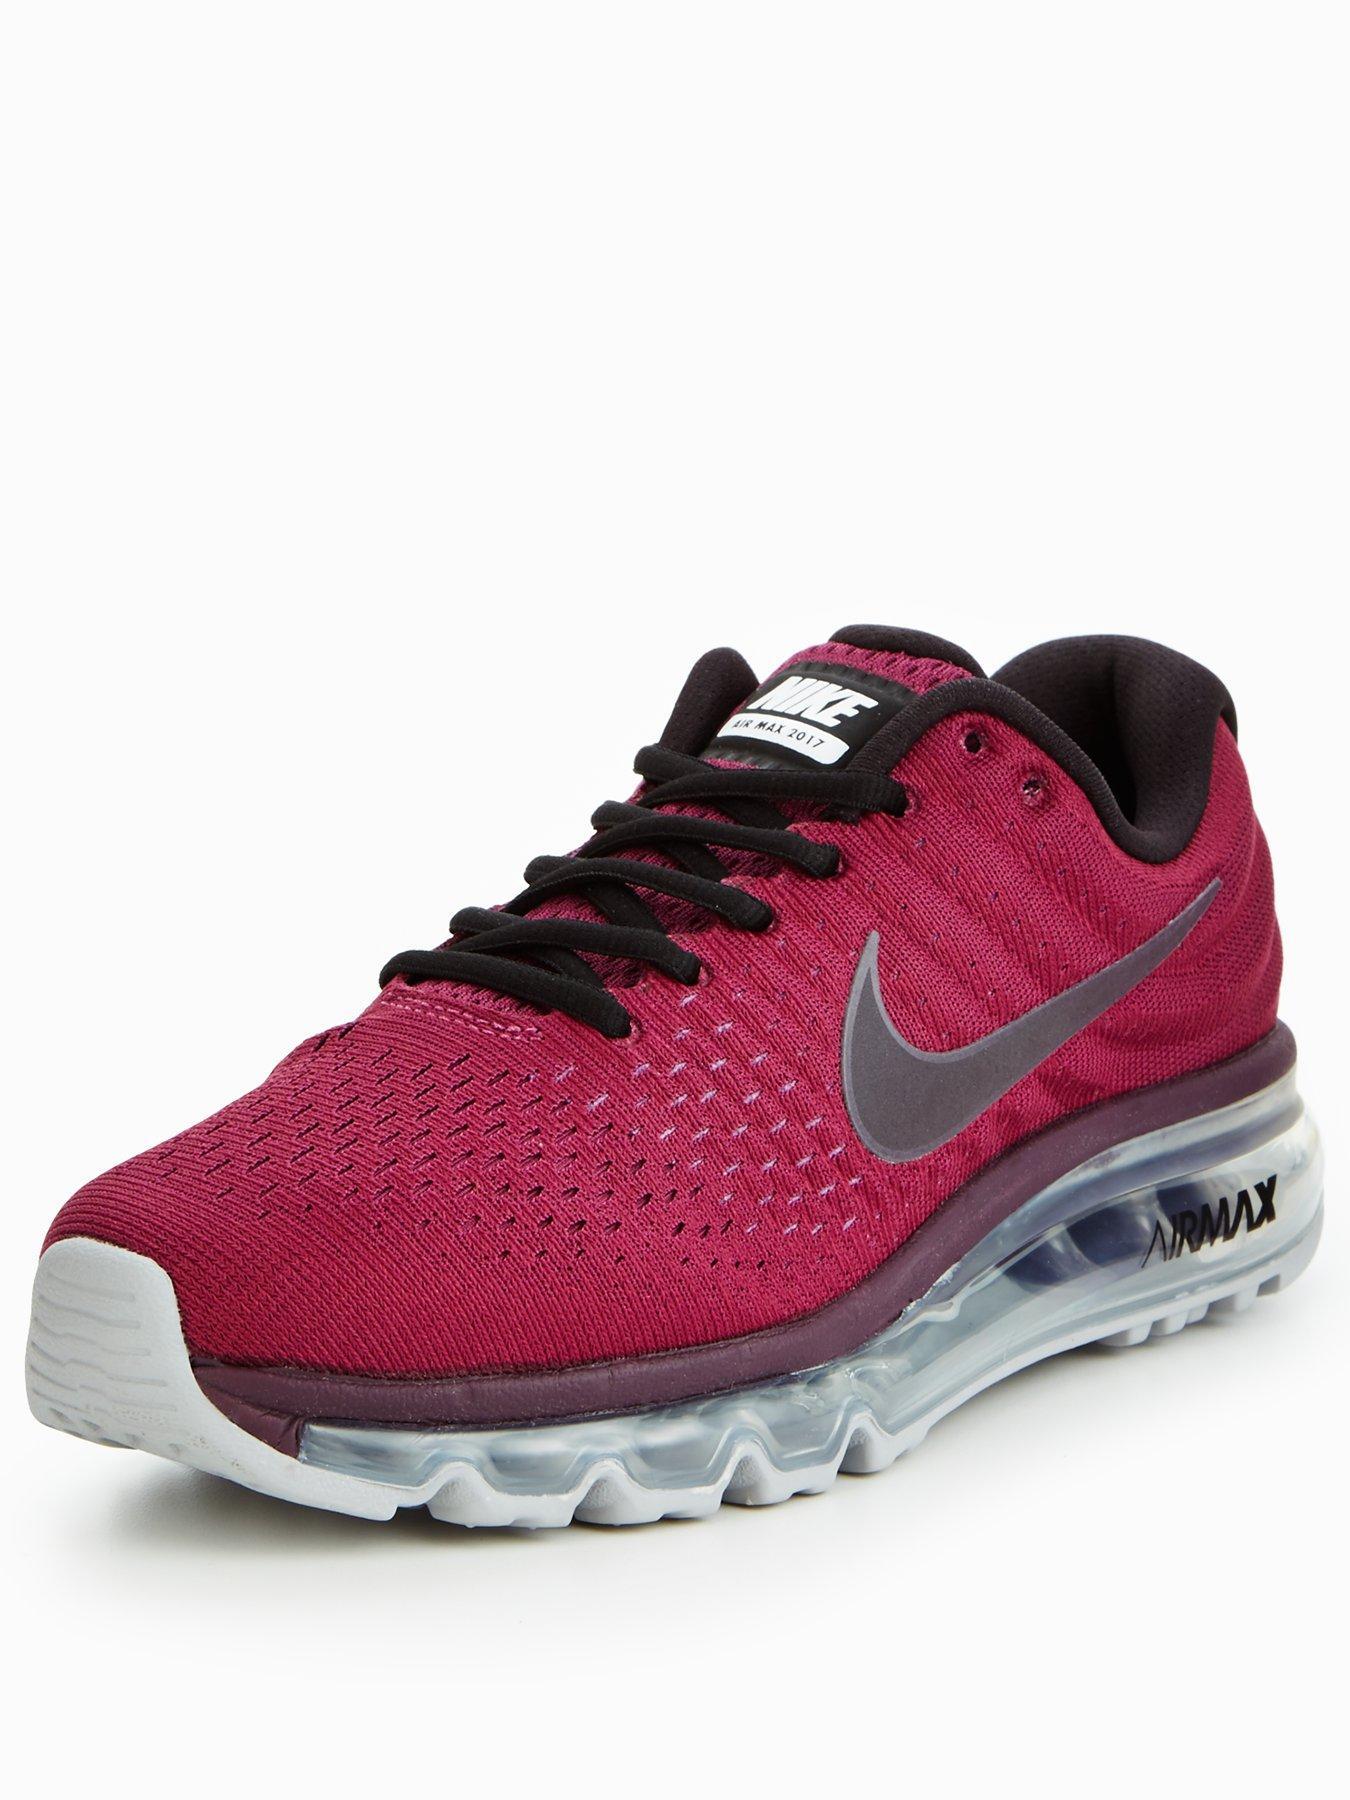 Nike Air Max 2017 Burgundy 1600179683 Women's Shoes Nike Trainers